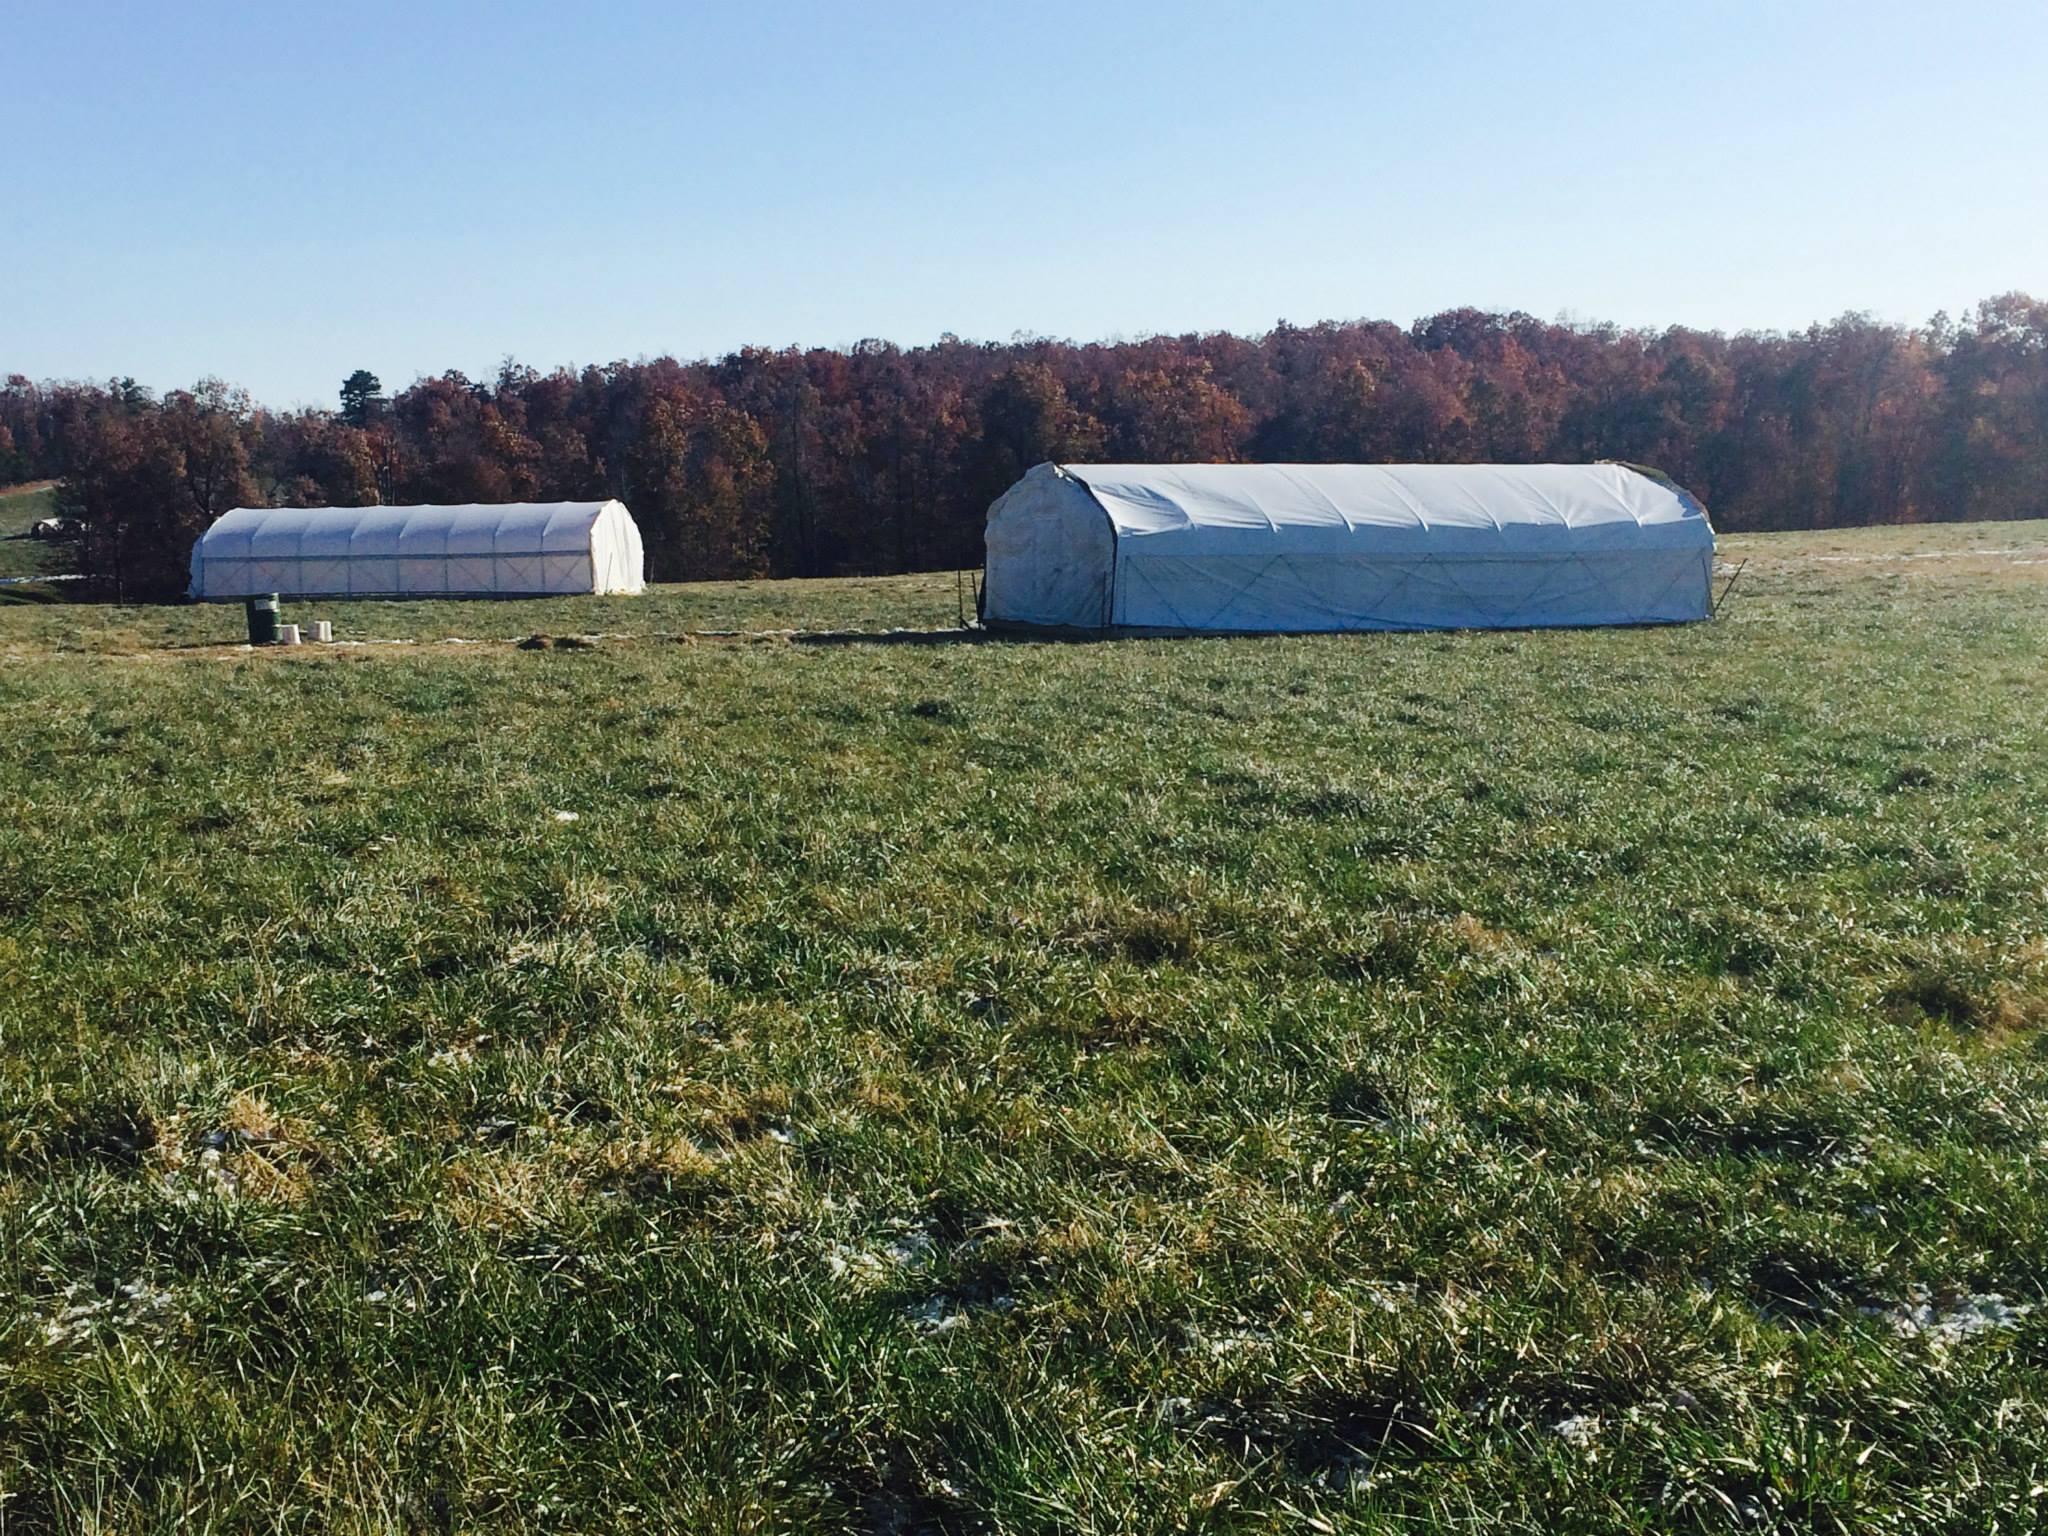 Prairie Schooners (20 x 40) at Falling Sky Farms near Conway, Arkansas